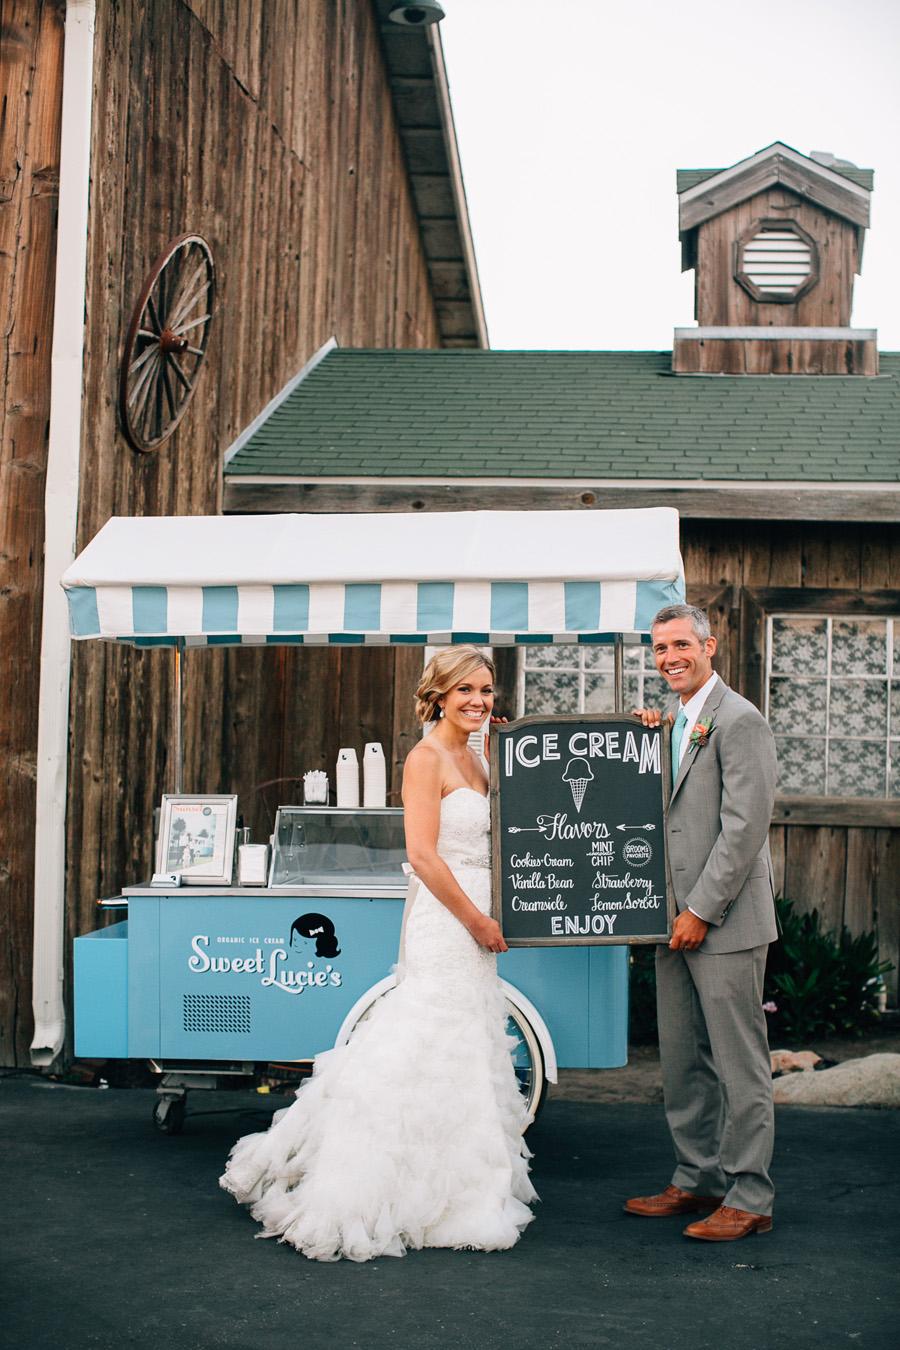 Jen_Rodriguez-Holland_Ranch_wedding45.JPG